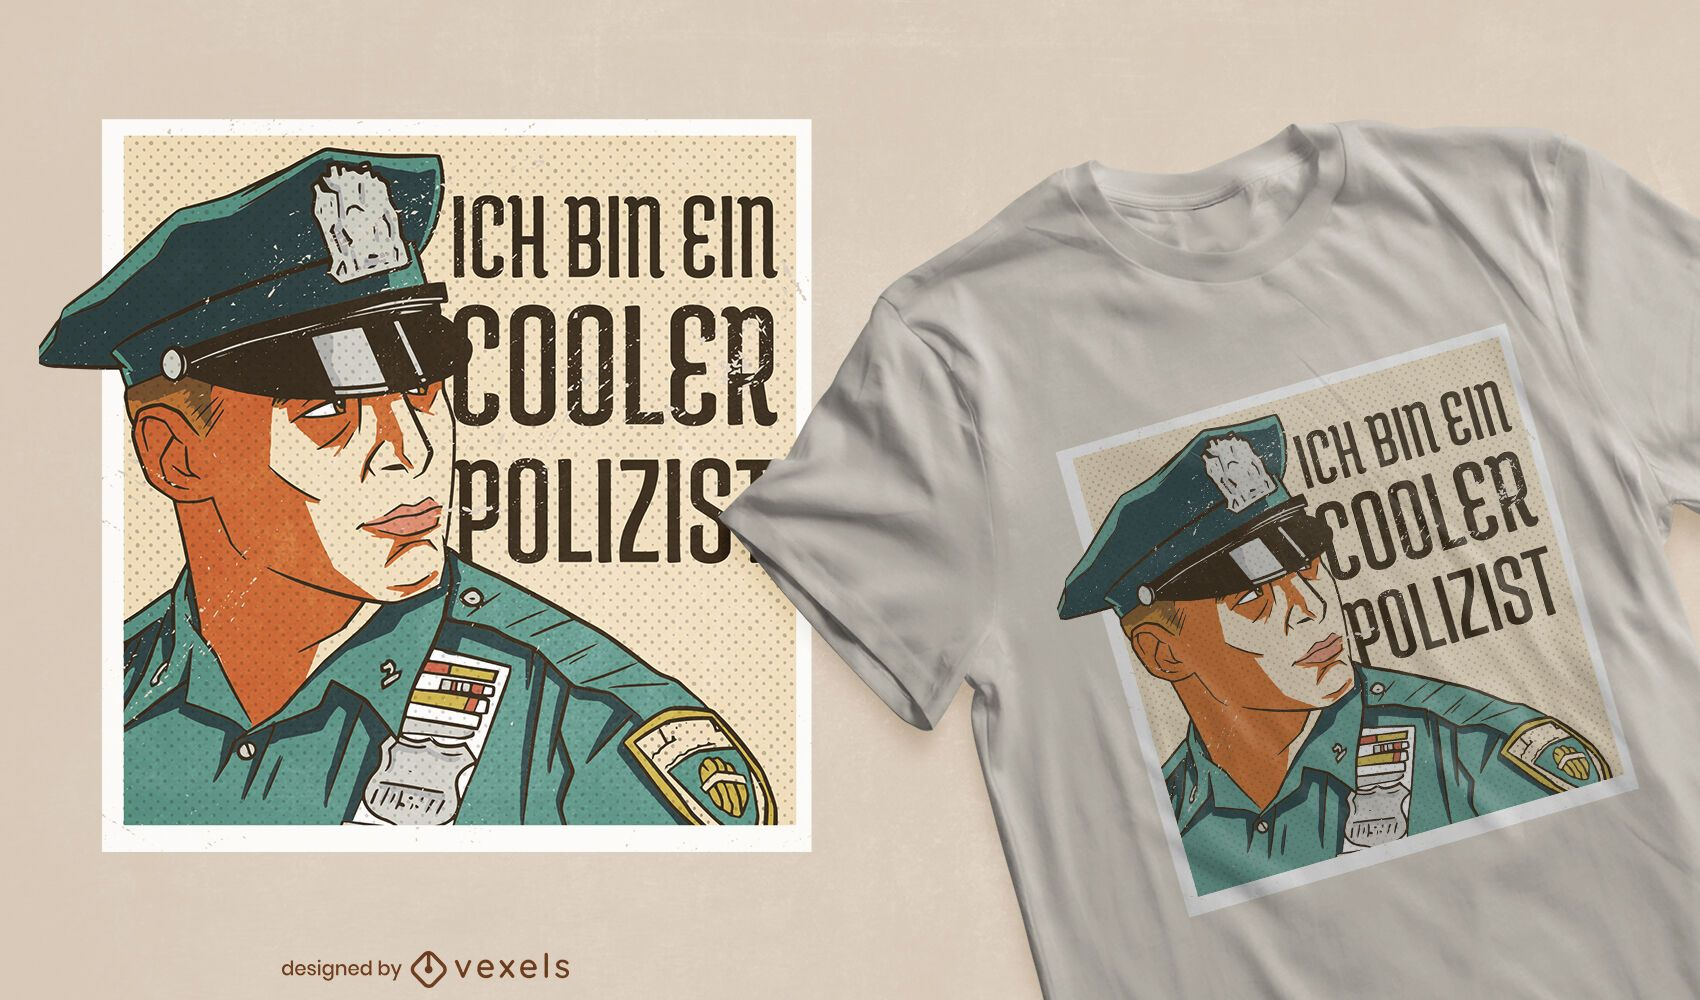 Cool cop German t-shirt design